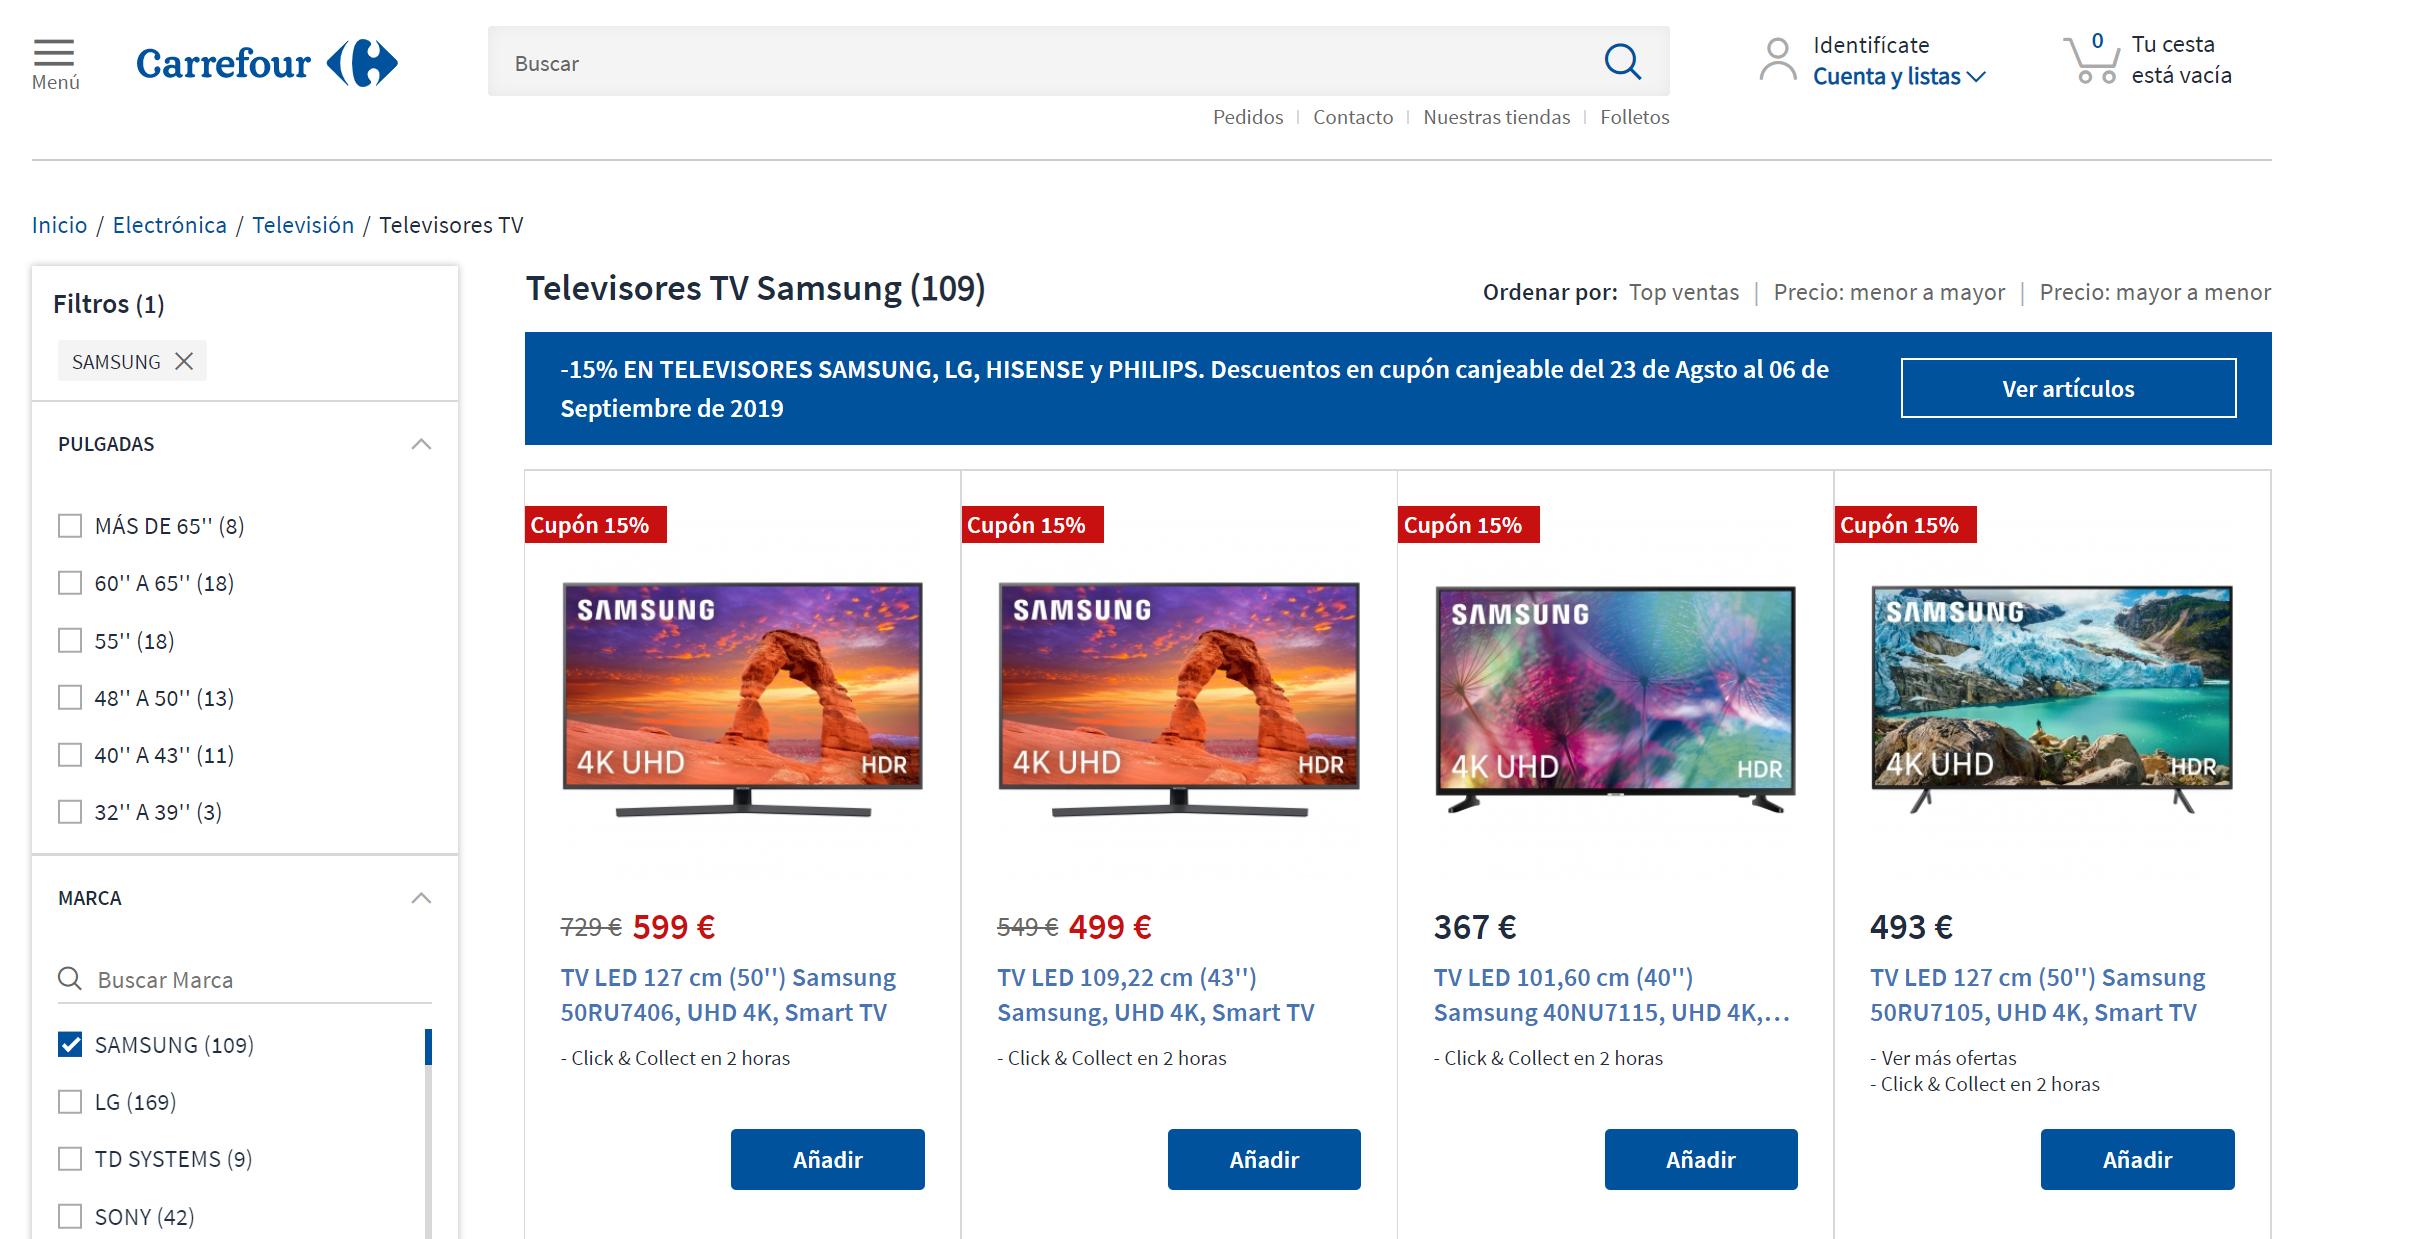 Carrefour: 15% descuento en televisores Samsung, LG, Hisense y Philips (Cupón canjeable)